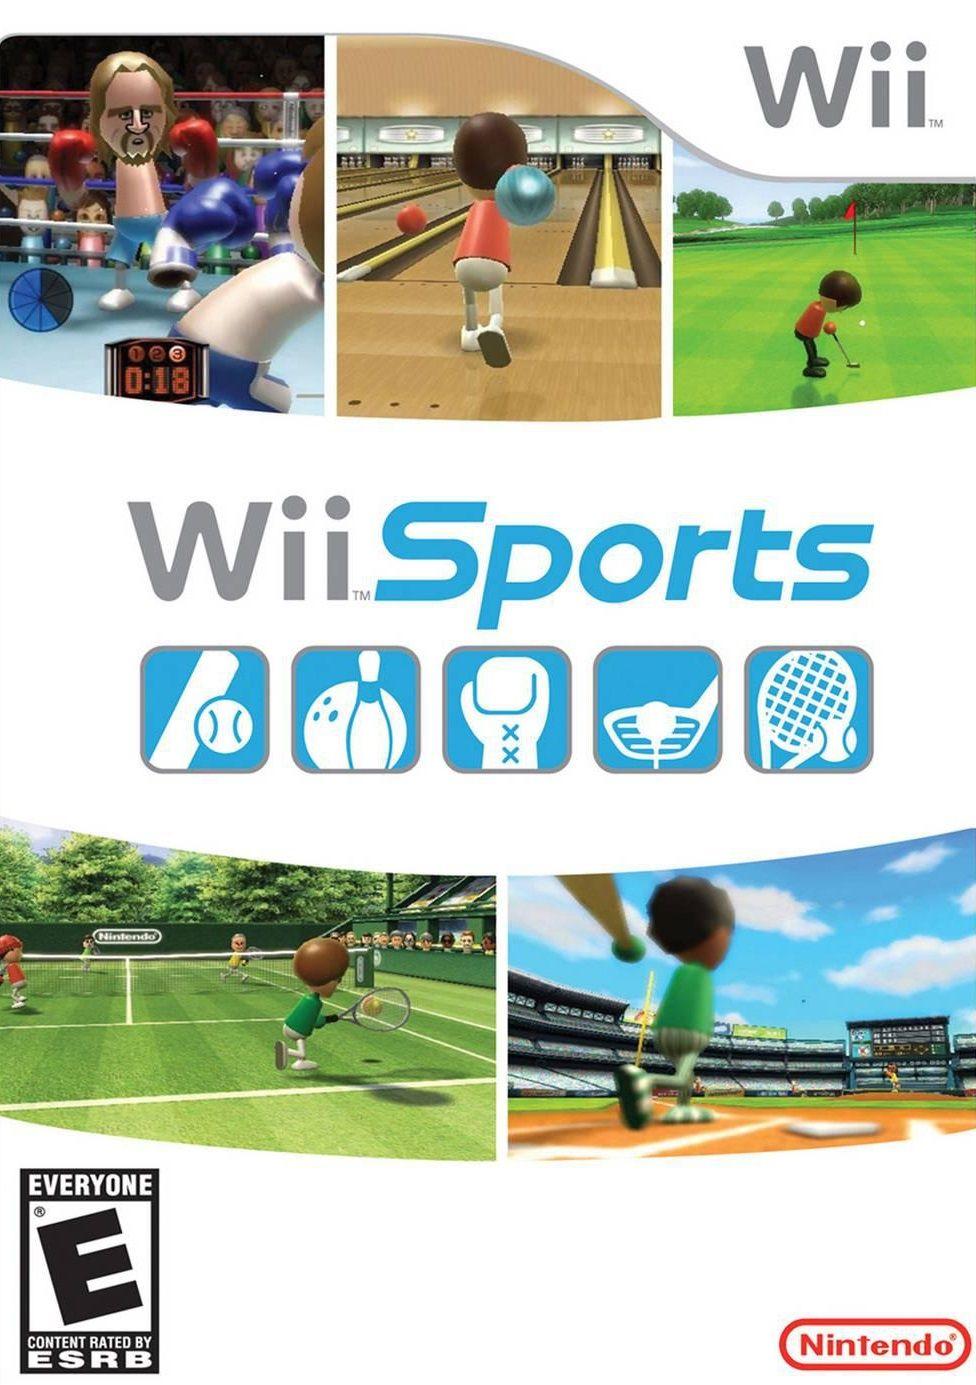 Wii Sports Nintendo Wii Game Wii Sports Wii Games Wii